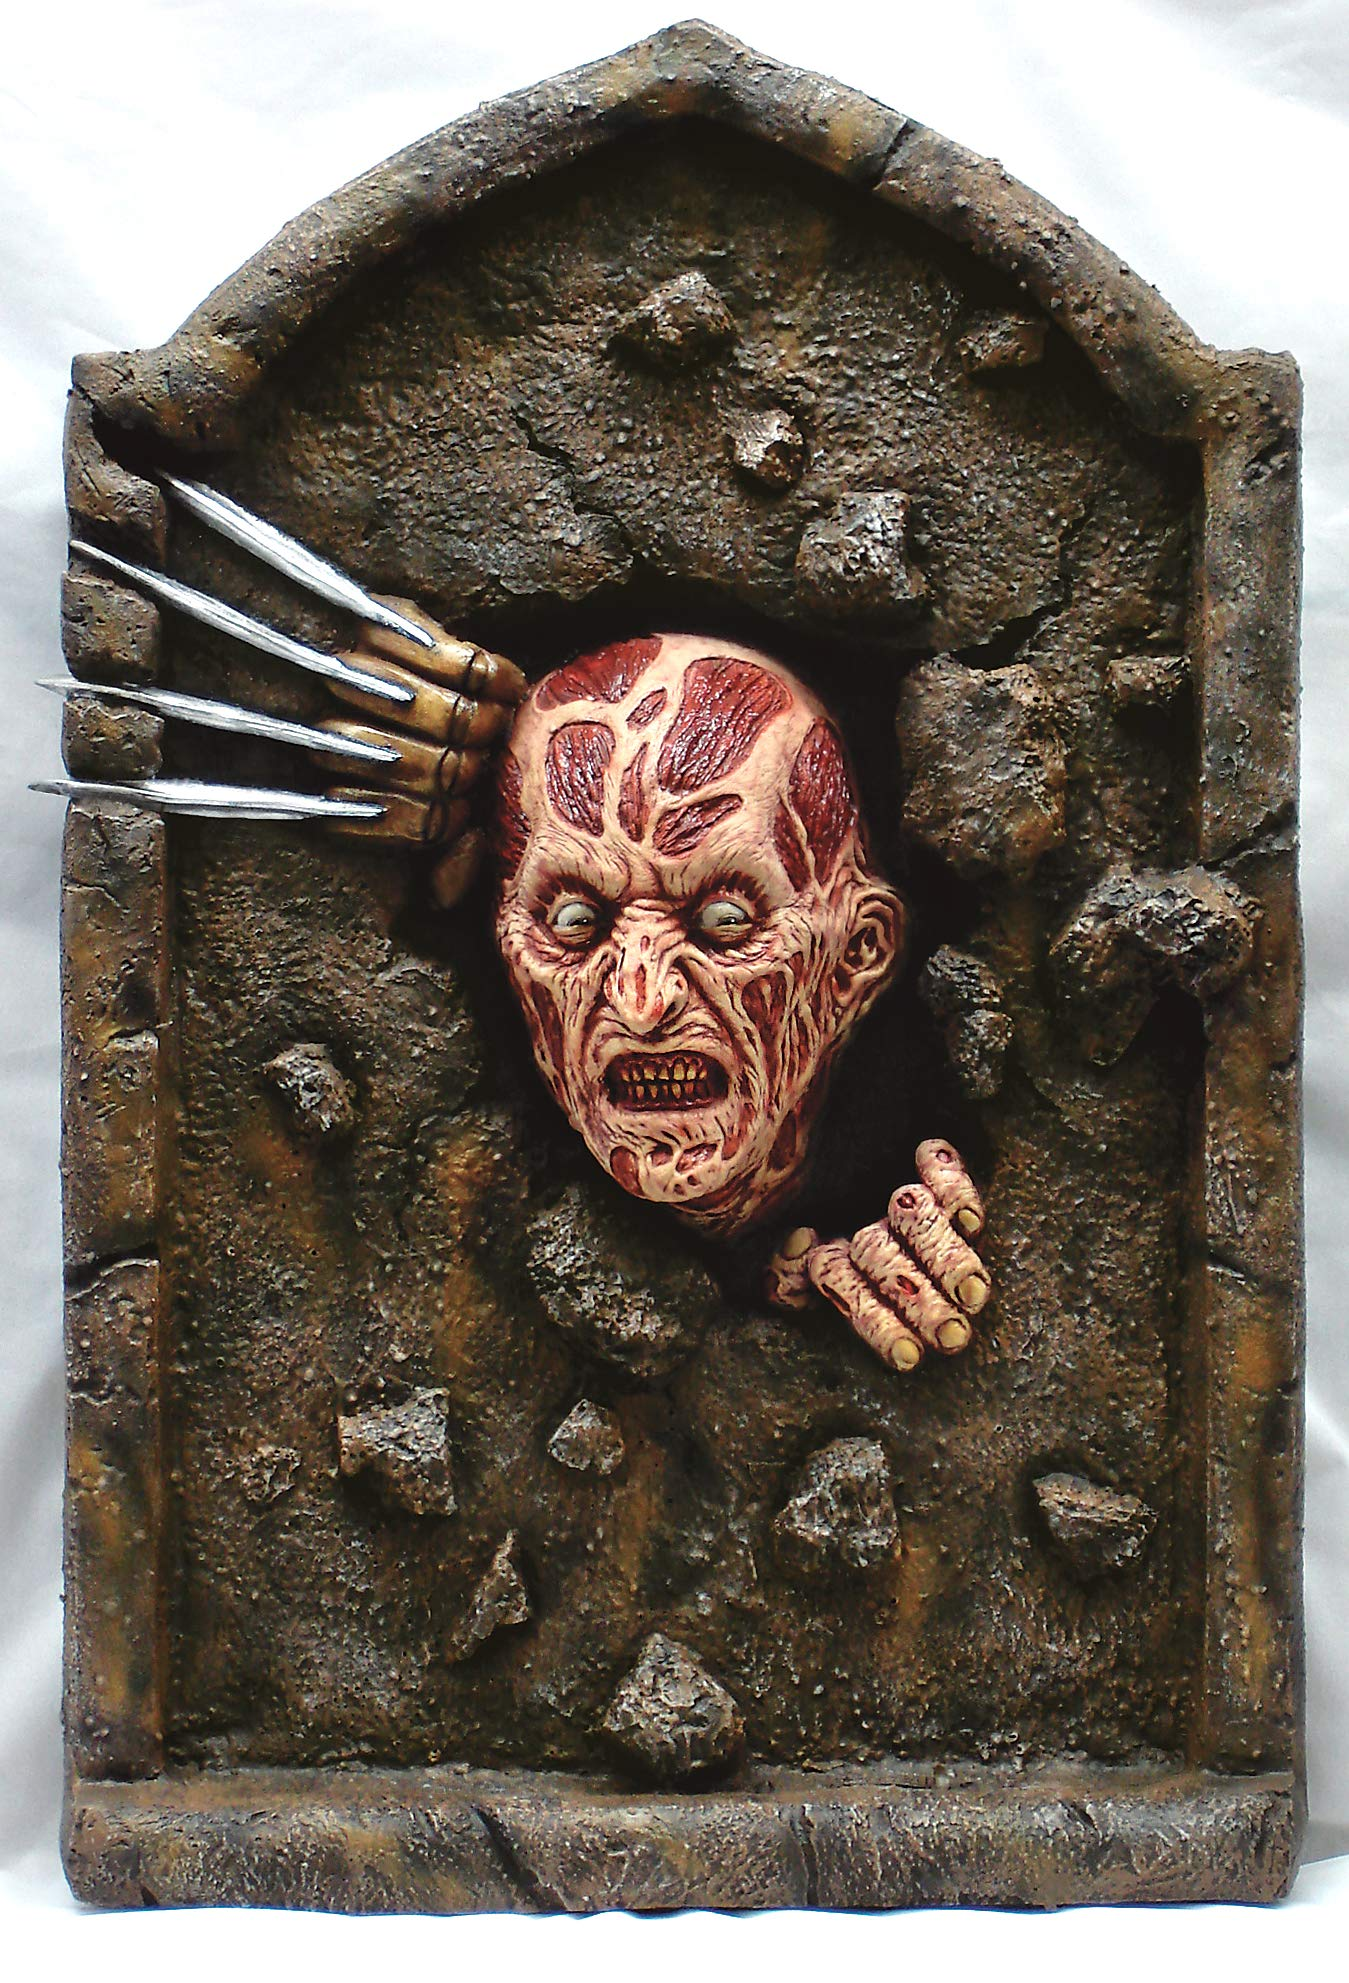 Nightmare on Elm Street Freddy Krueger Tombstone Party Decoration